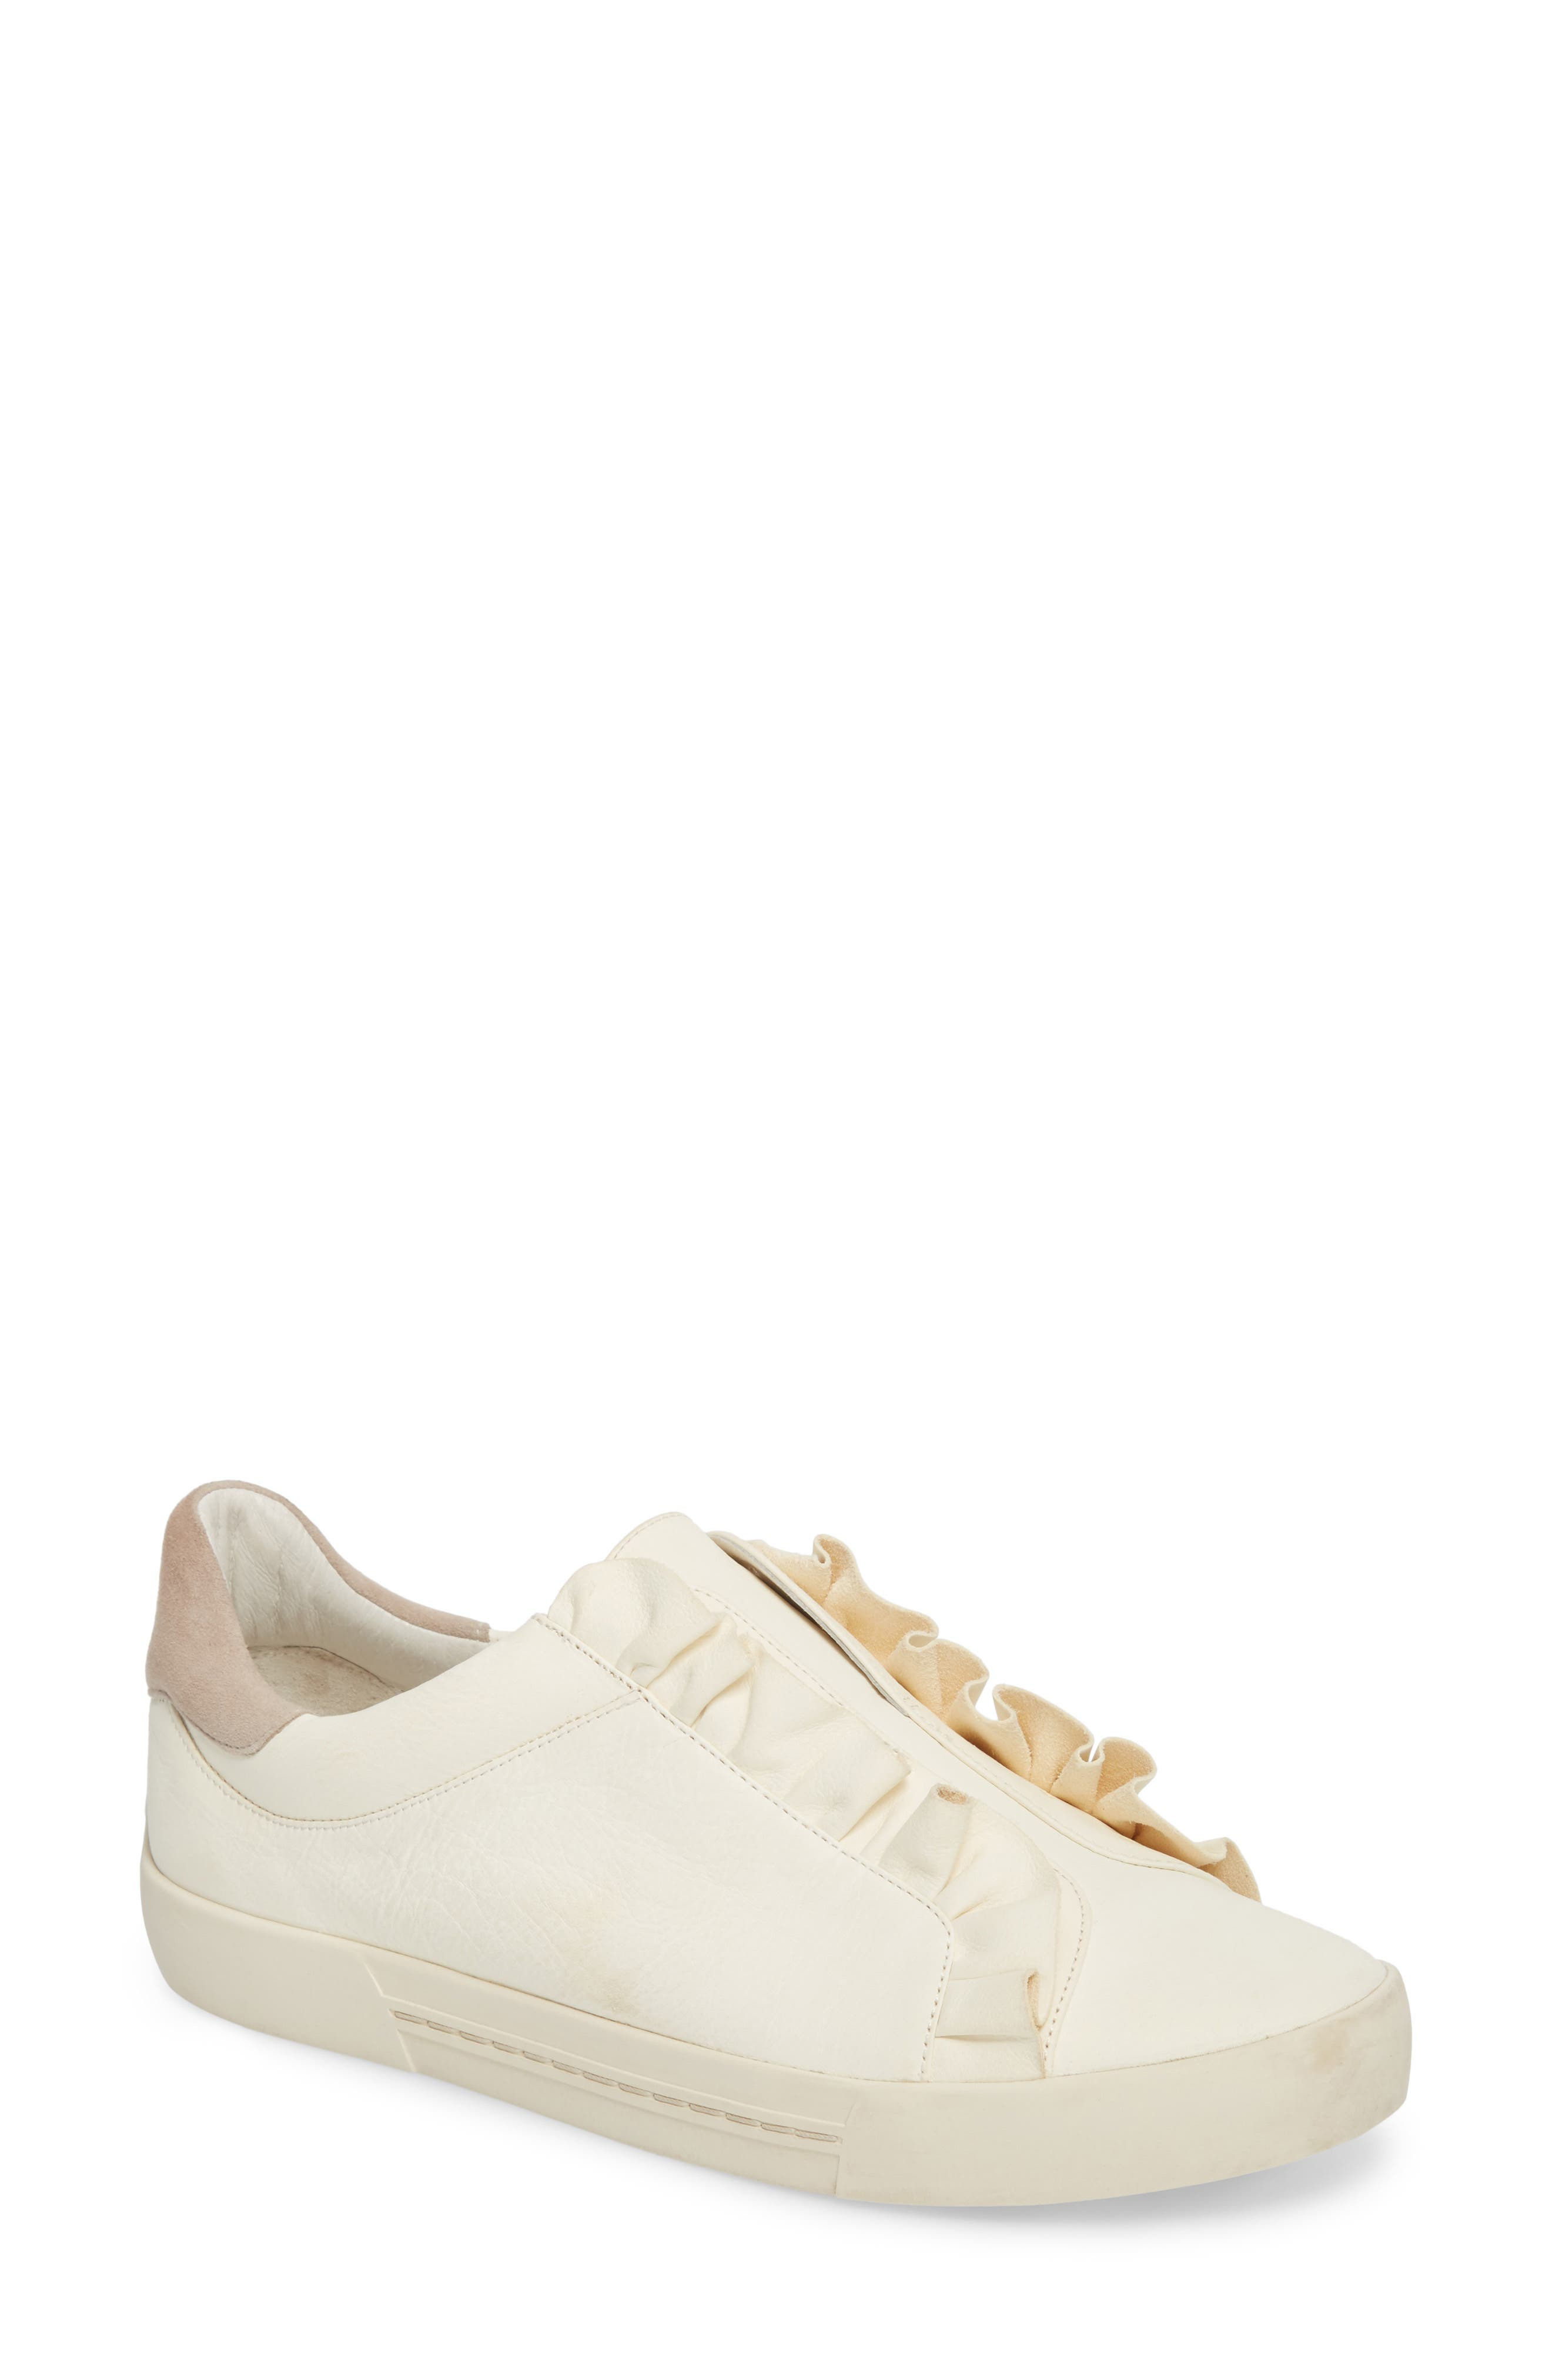 Daw Ruffle Slip-On Sneaker,                         Main,                         color, 900